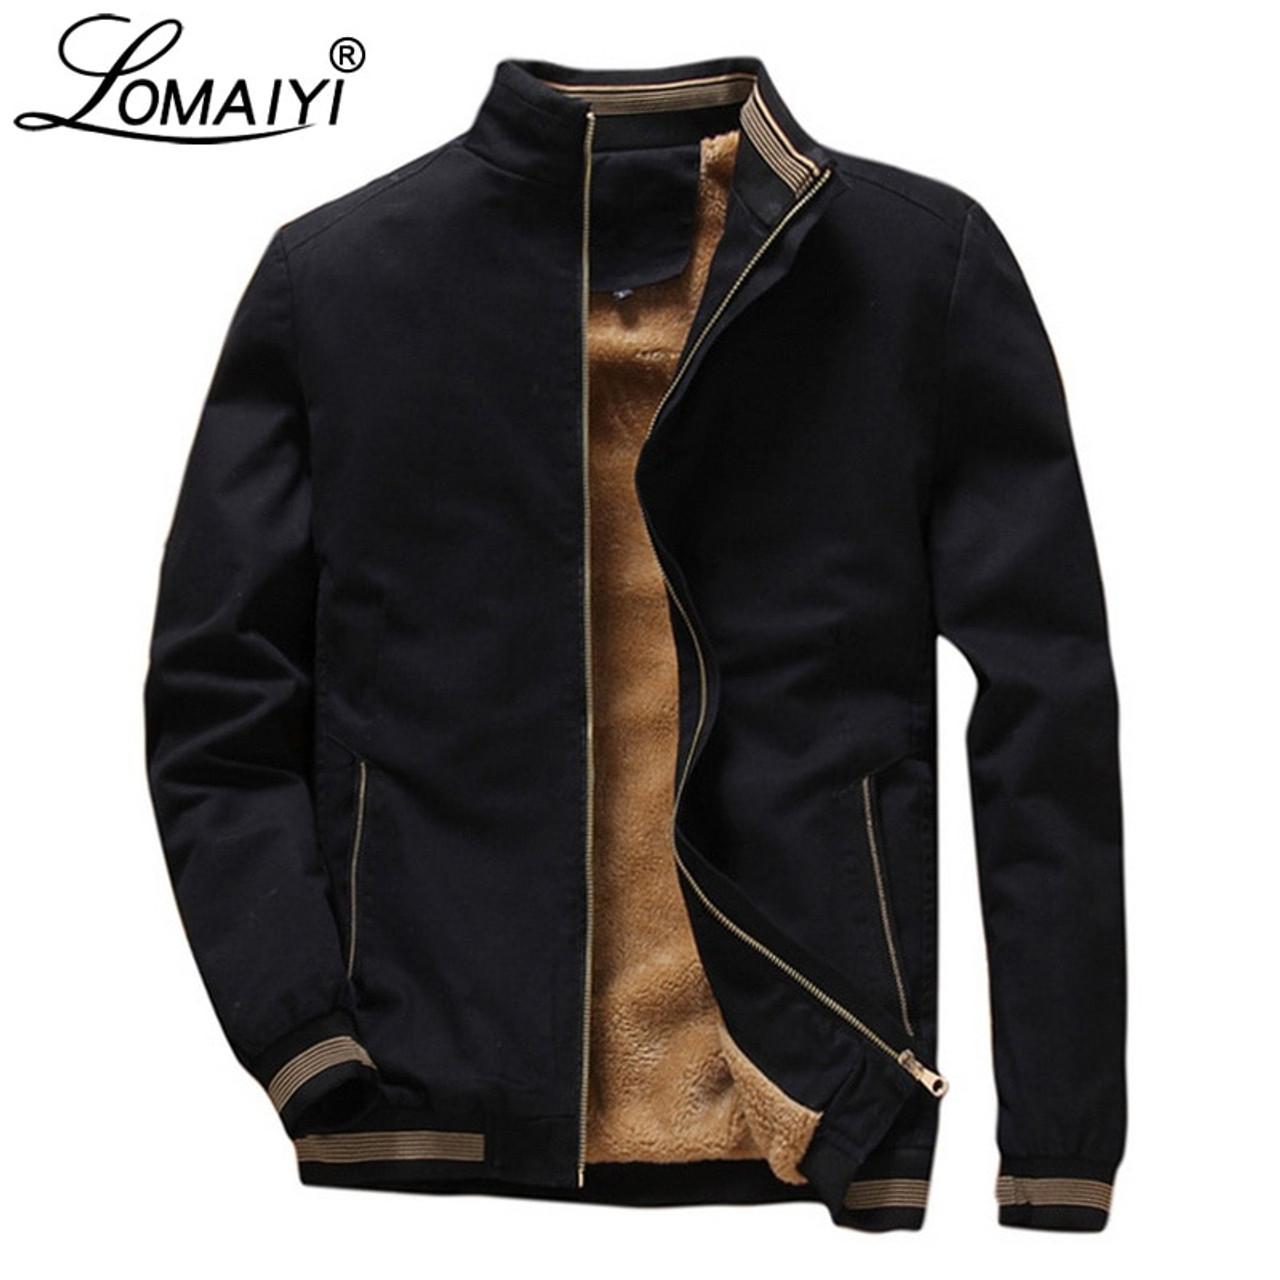 LOMAIYI Men's Winter Pure Cotton Jackets Men 2018 Casual Fleece Lining Coats  4XL Mens Warm Windbreaker Male Jacket Clothes BM260 - OnshopDeals.Com